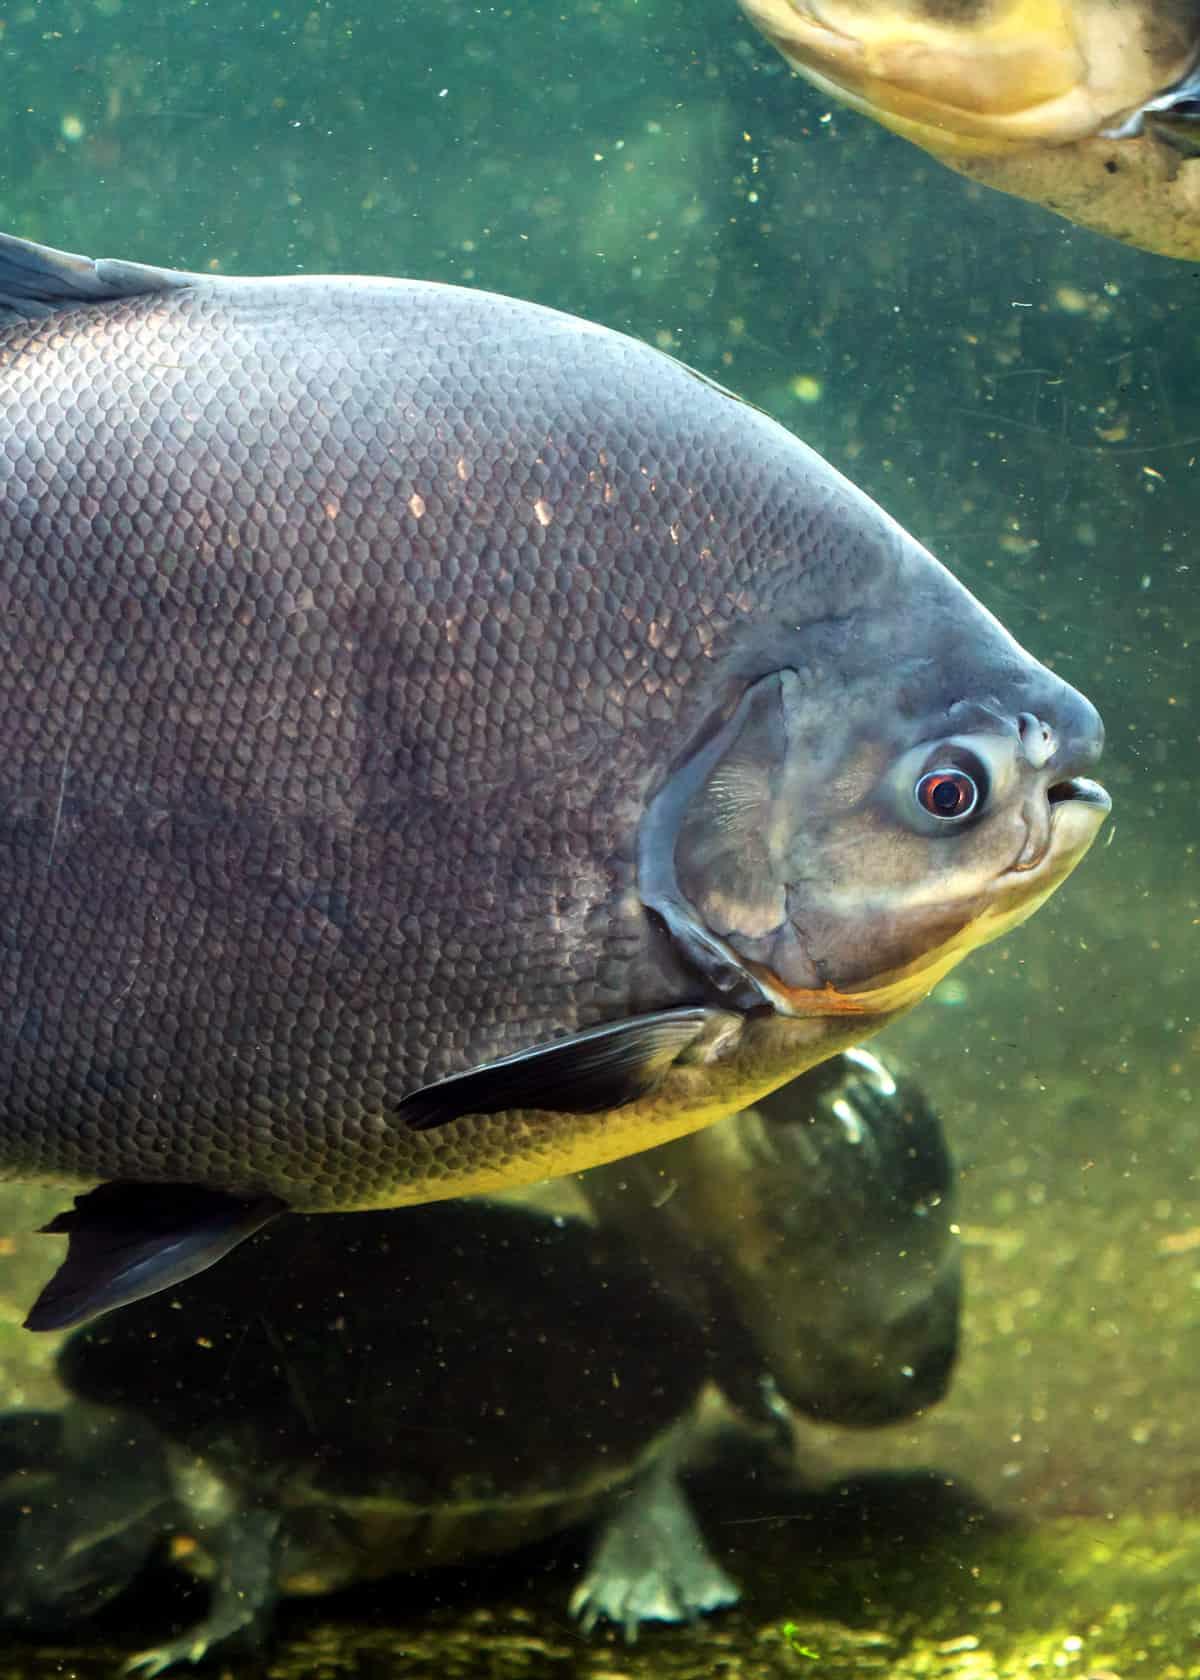 blackfin pacu fish